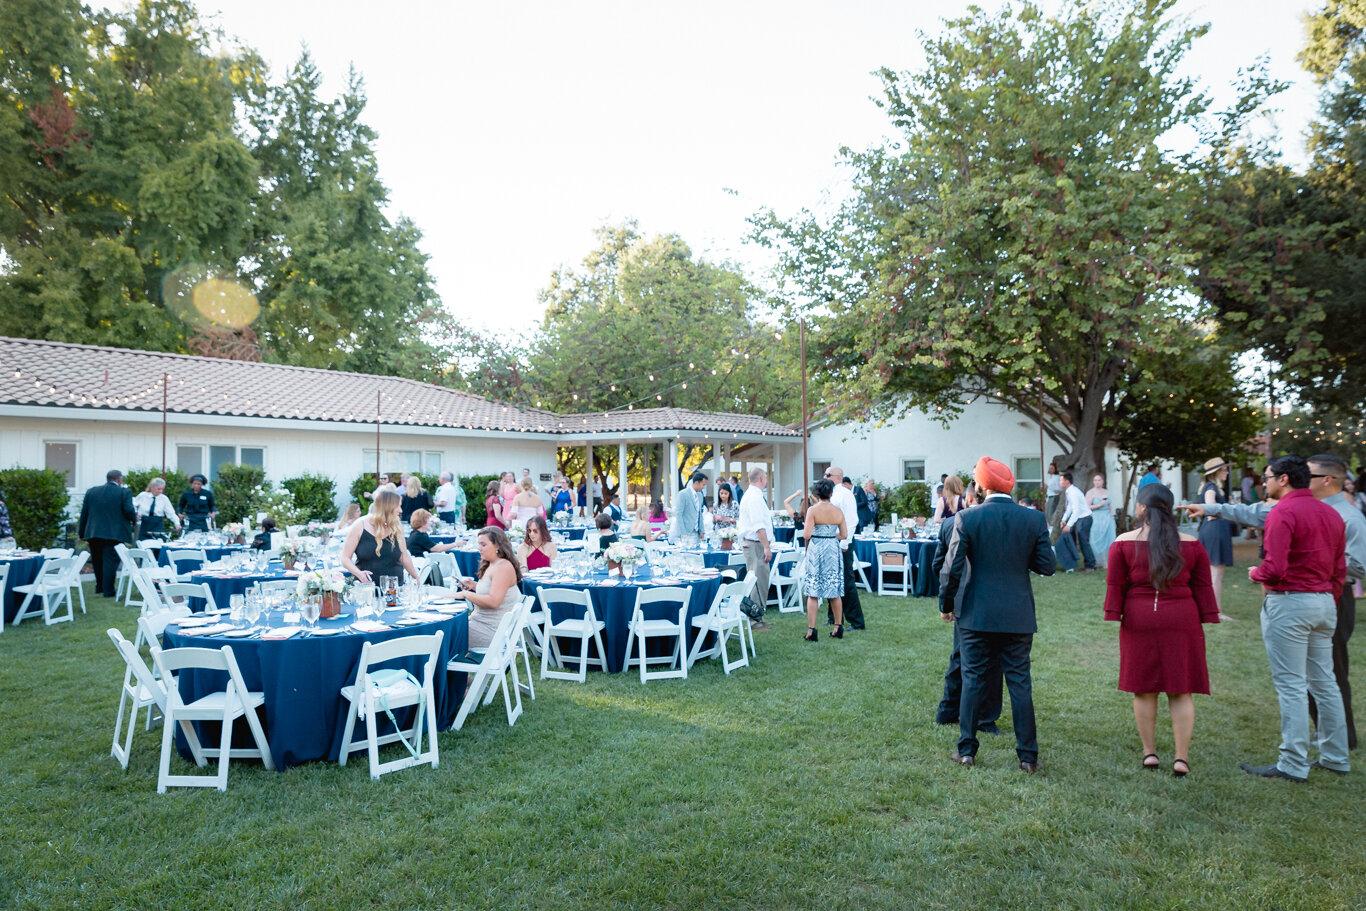 2019.08.24_Emily-Ashir-Wedding-at-the-Maples-6127.jpg